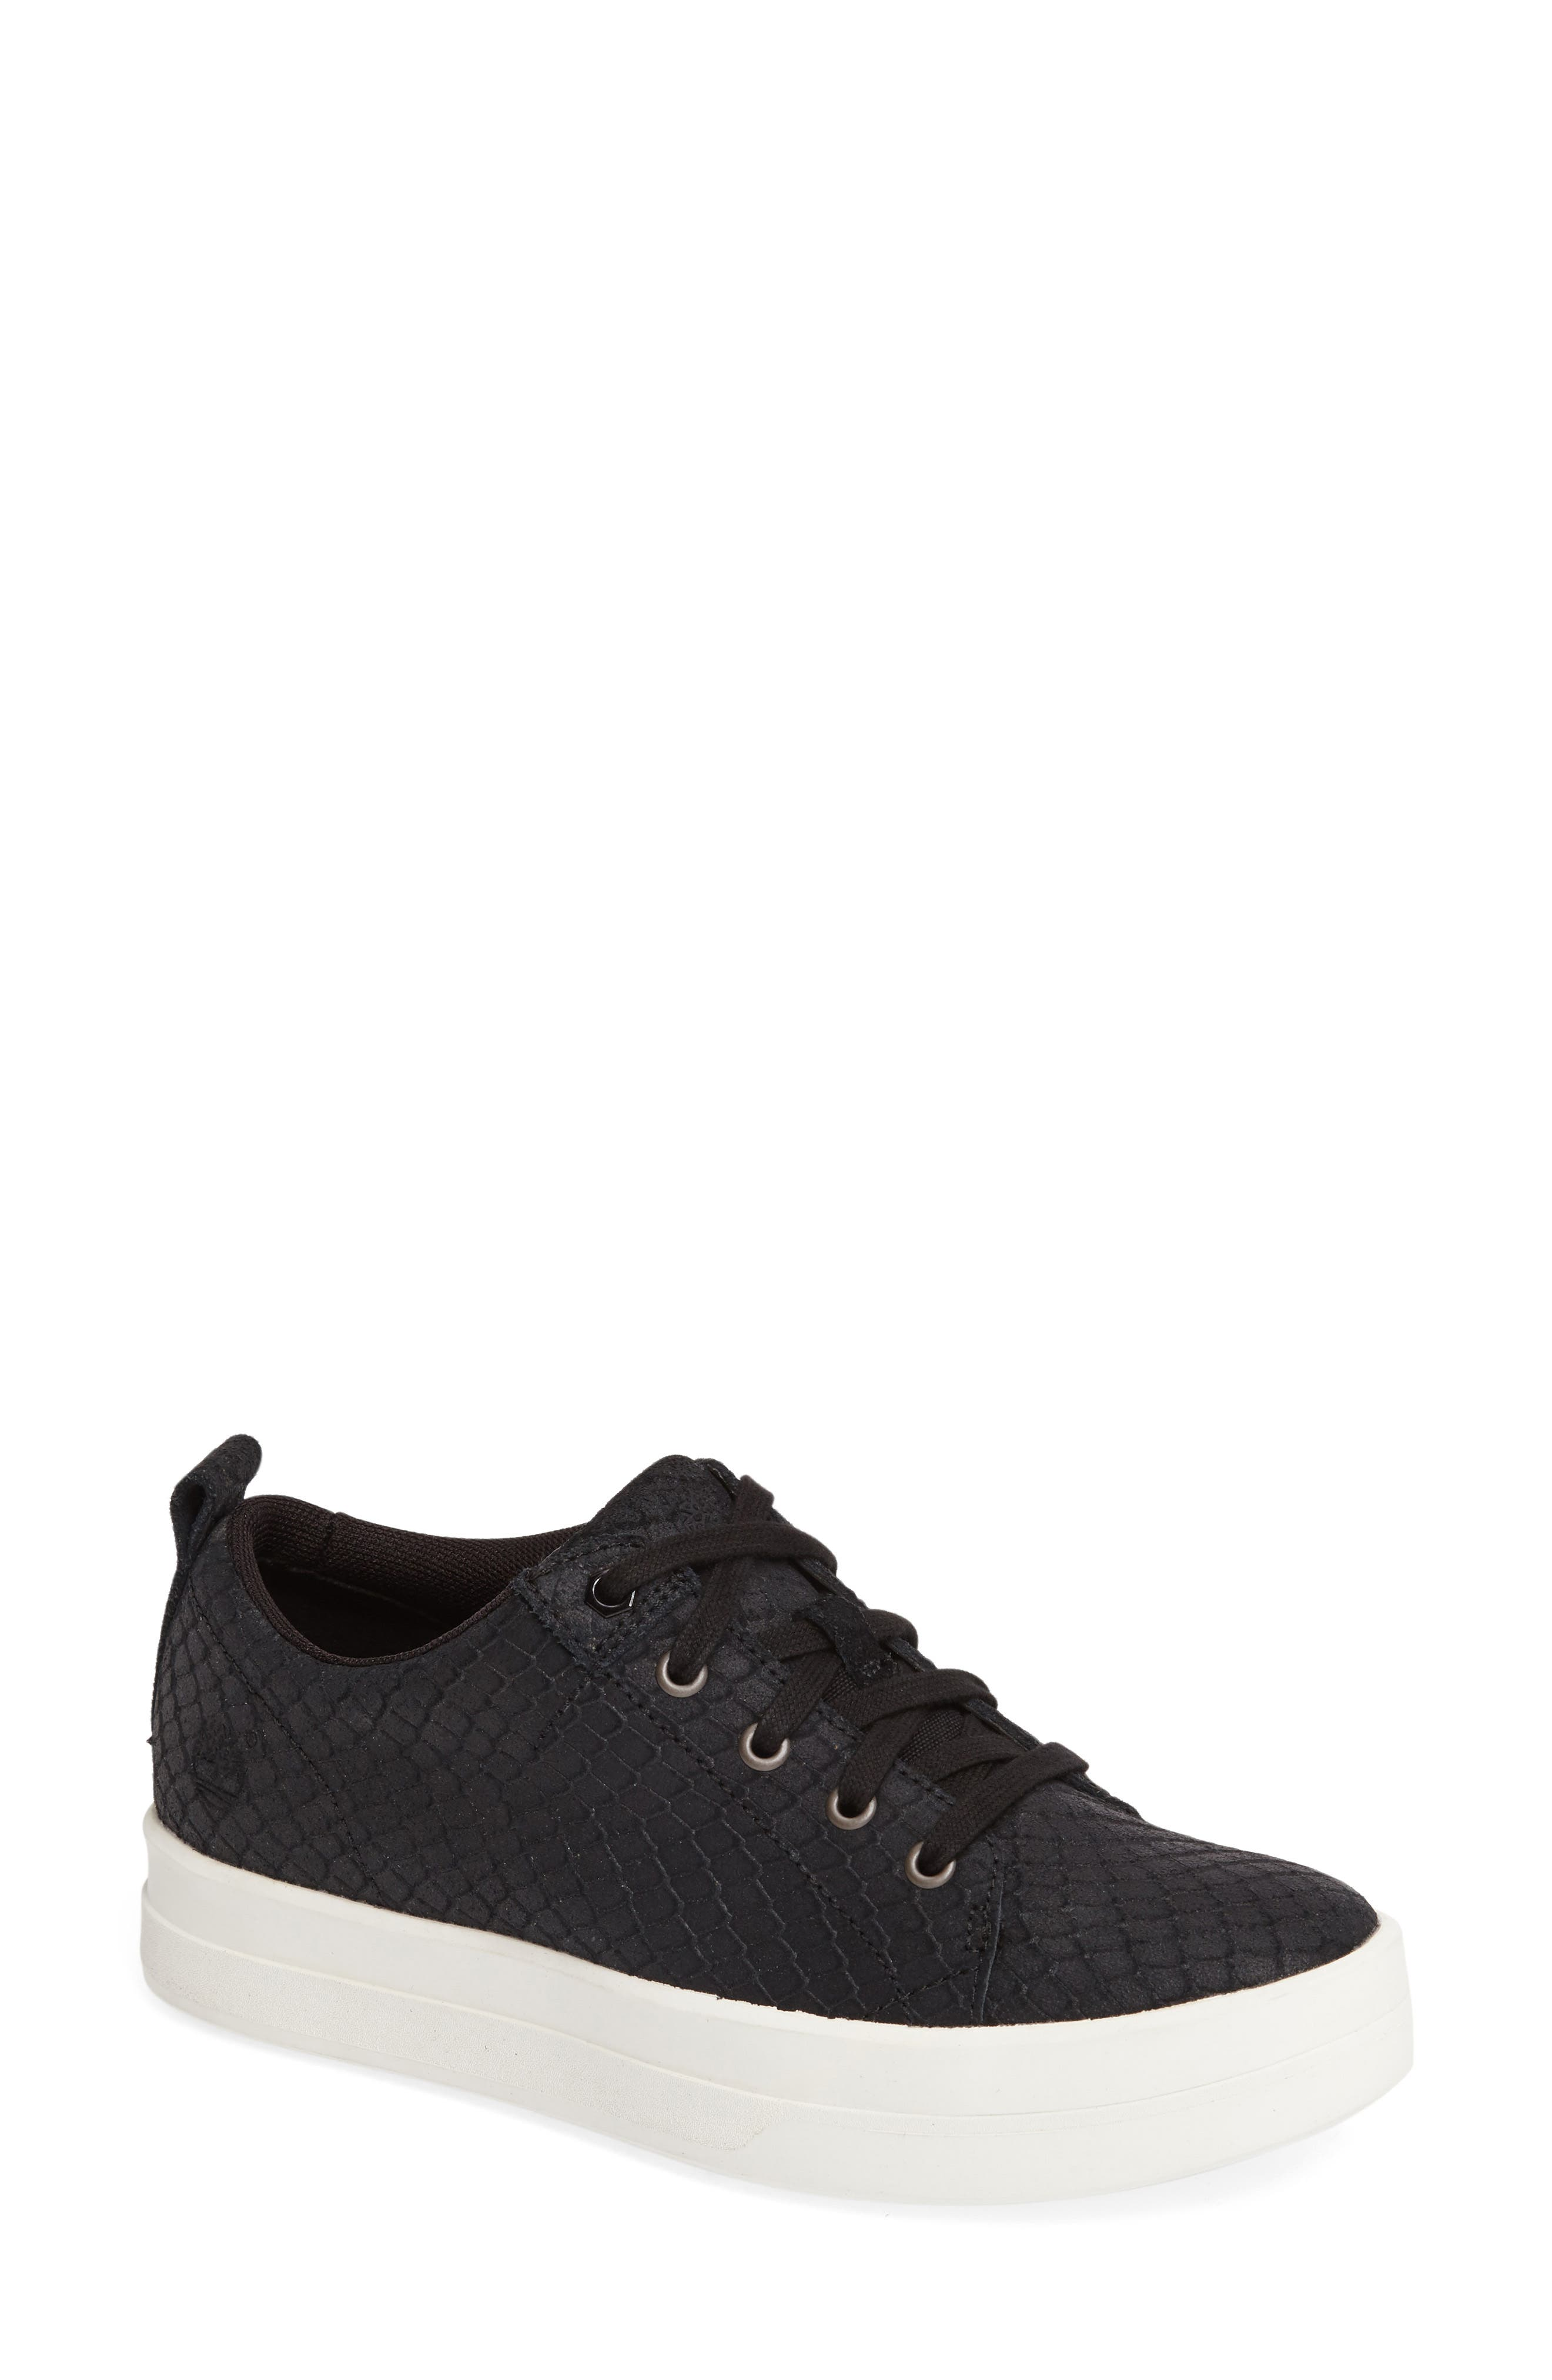 Mayliss Oxford Sneaker,                             Main thumbnail 1, color,                             001